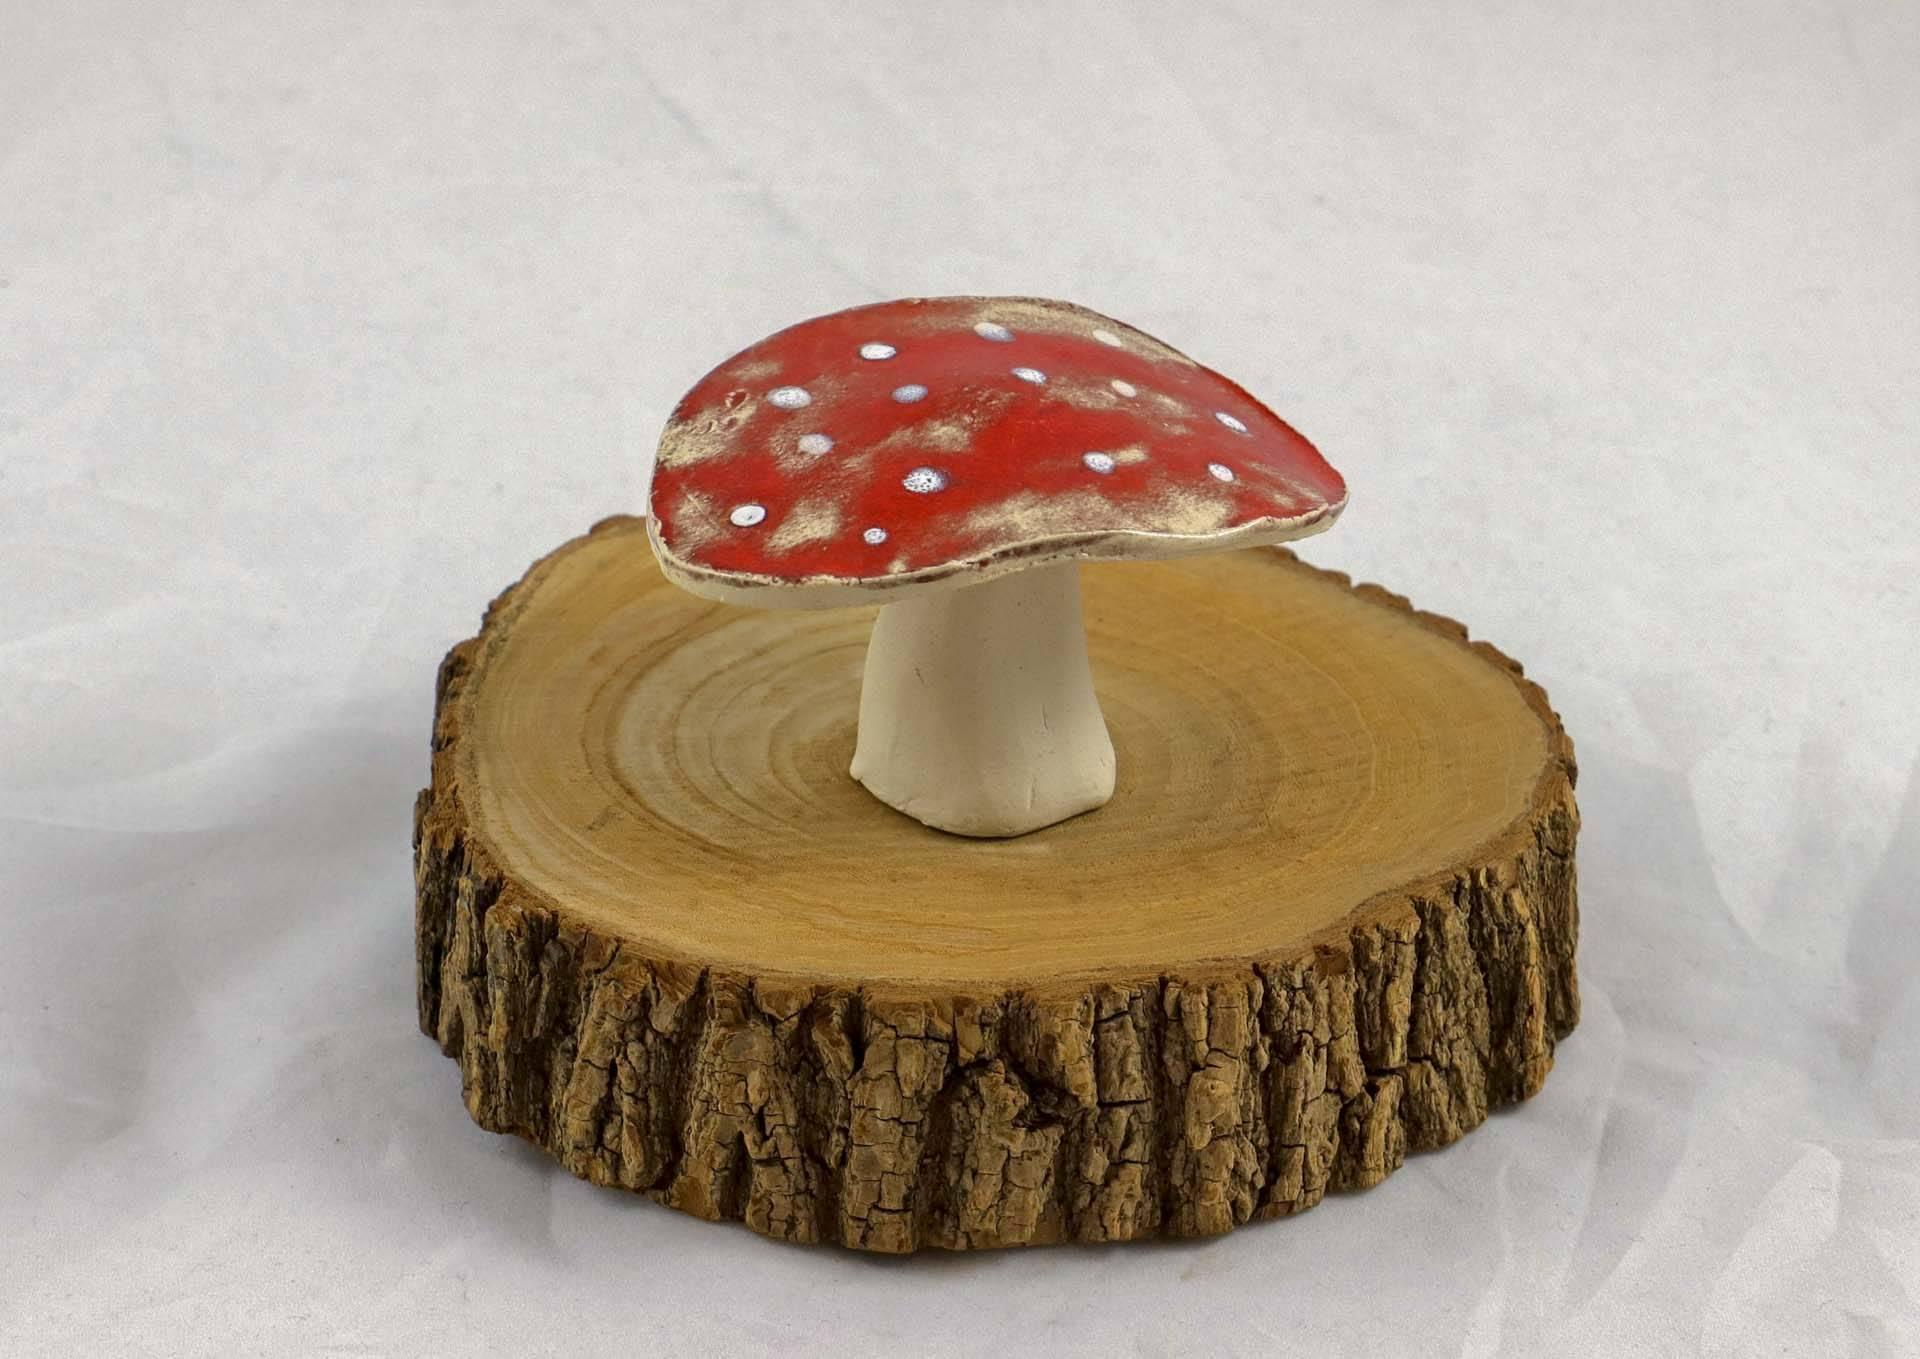 Petra Zobl Keramik - Pilz groß rot Glücksbringer